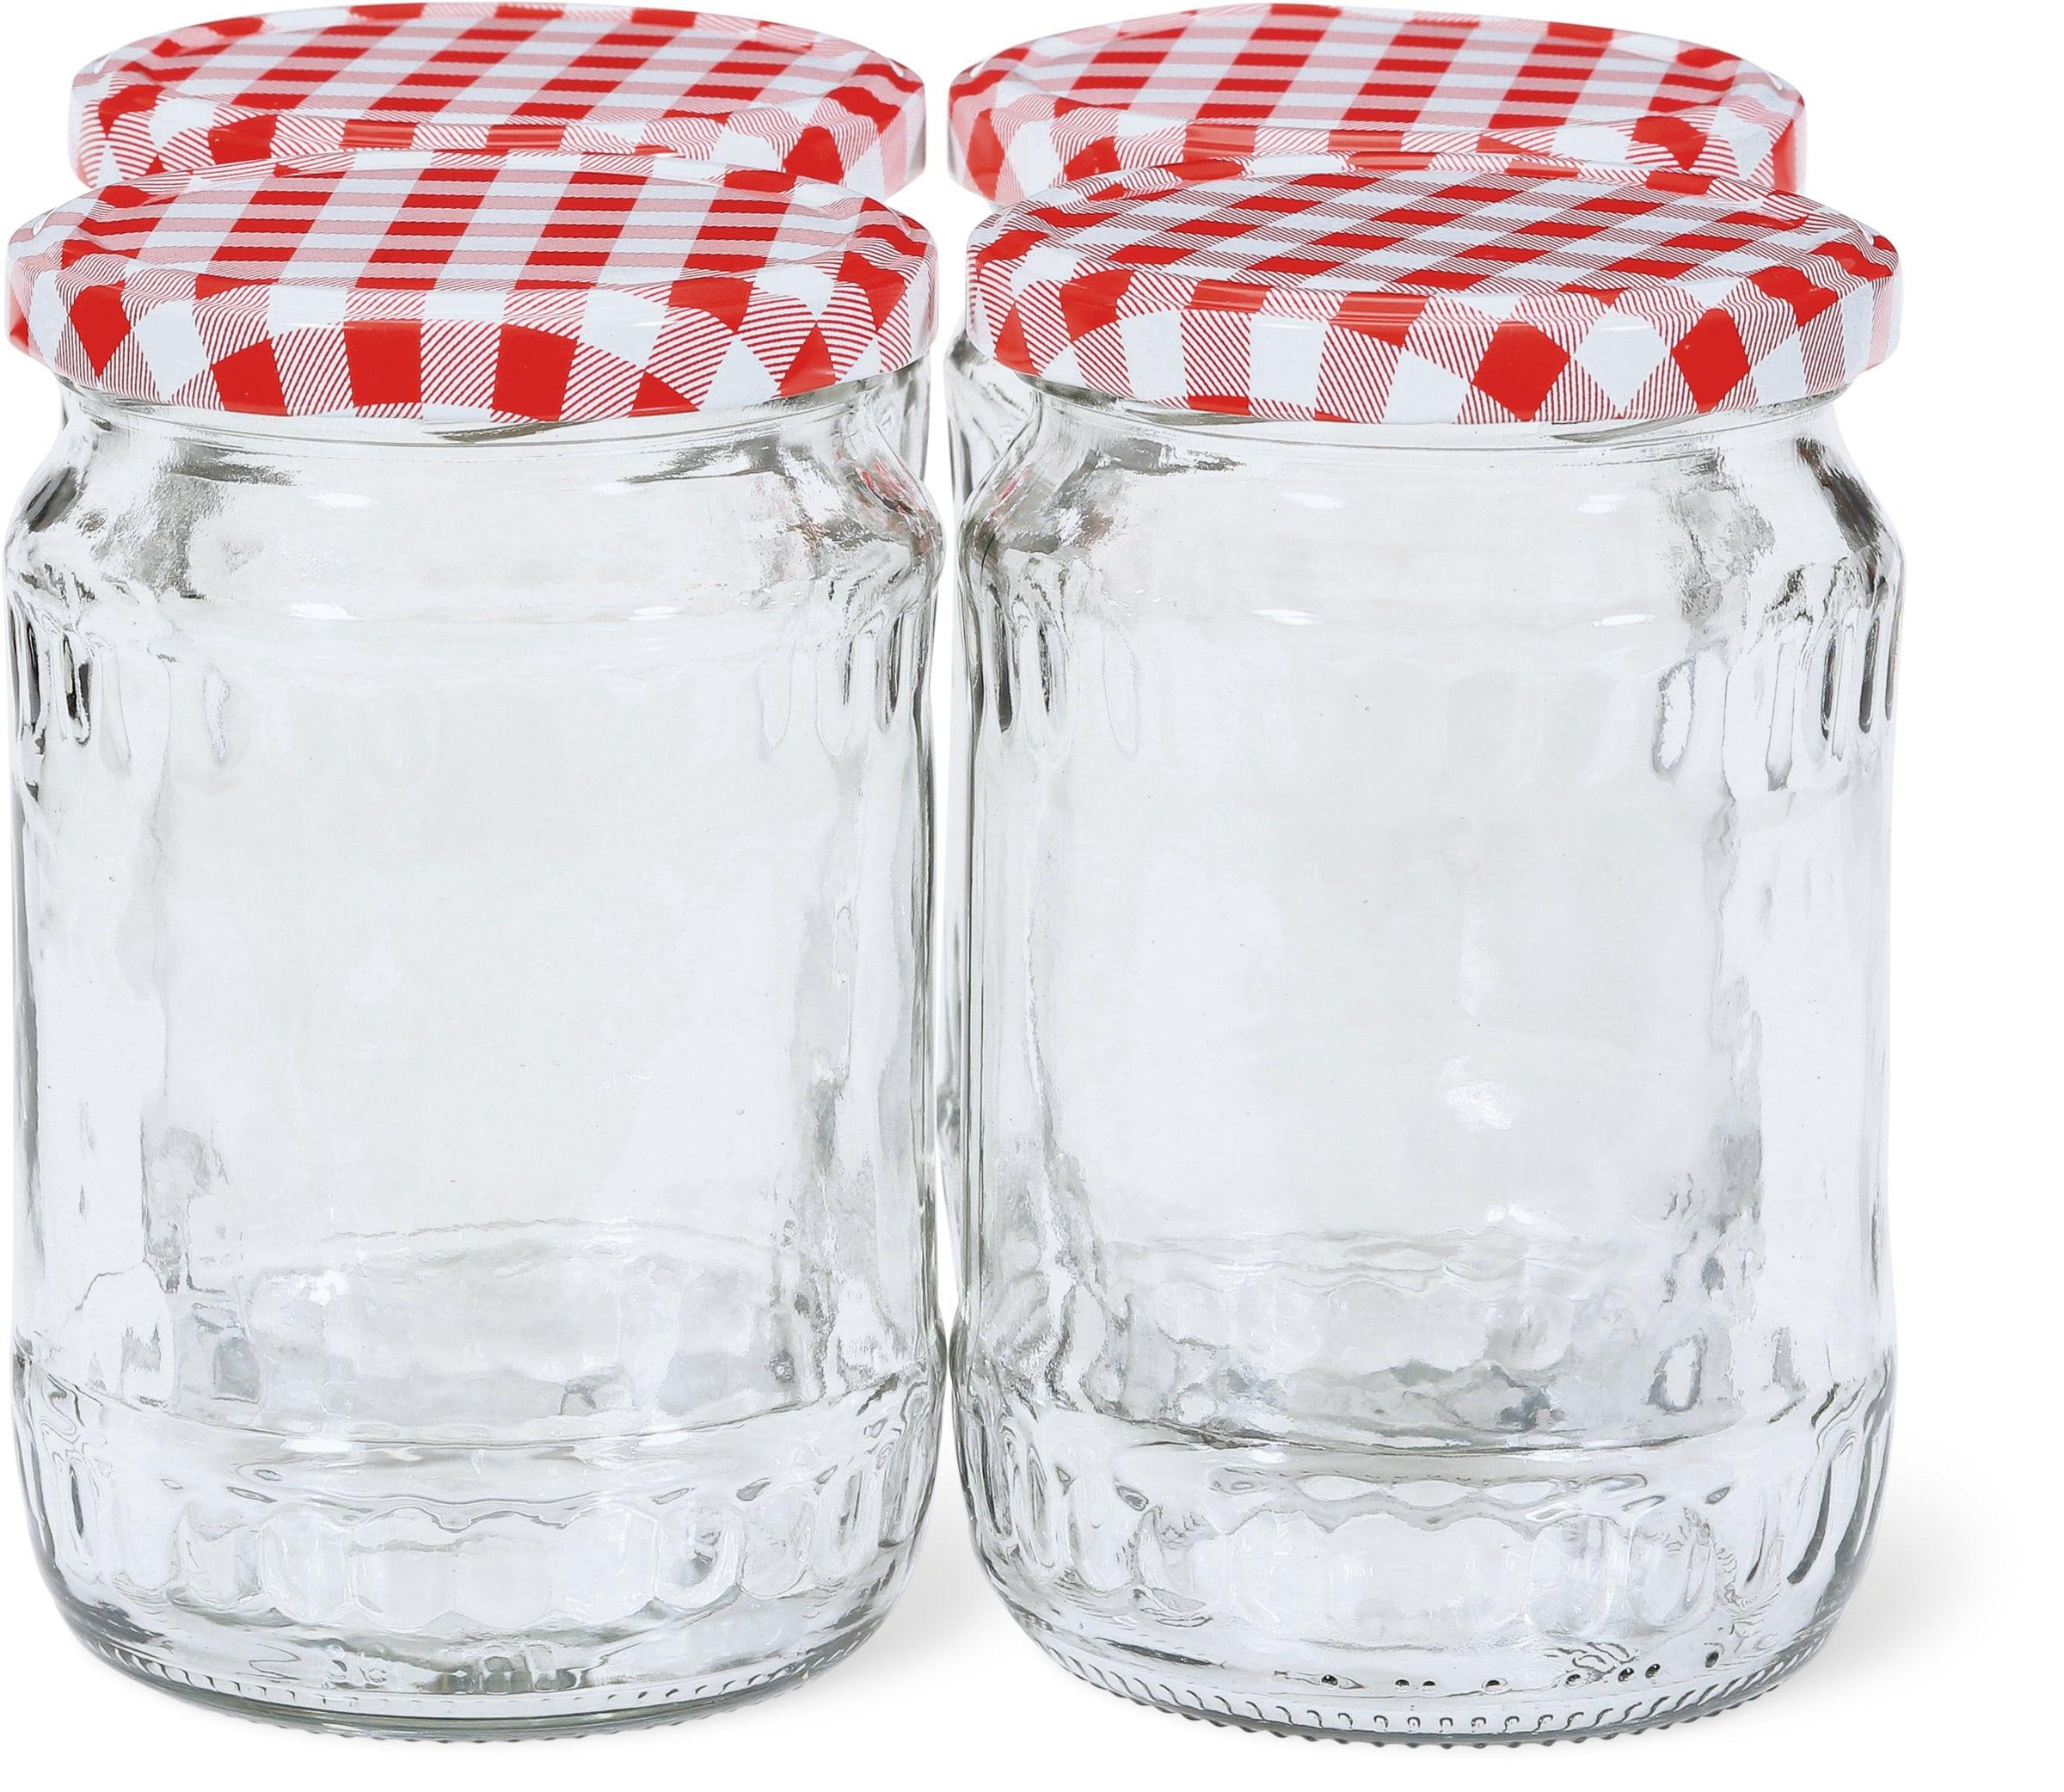 Cucina & Tavola Einmachglas